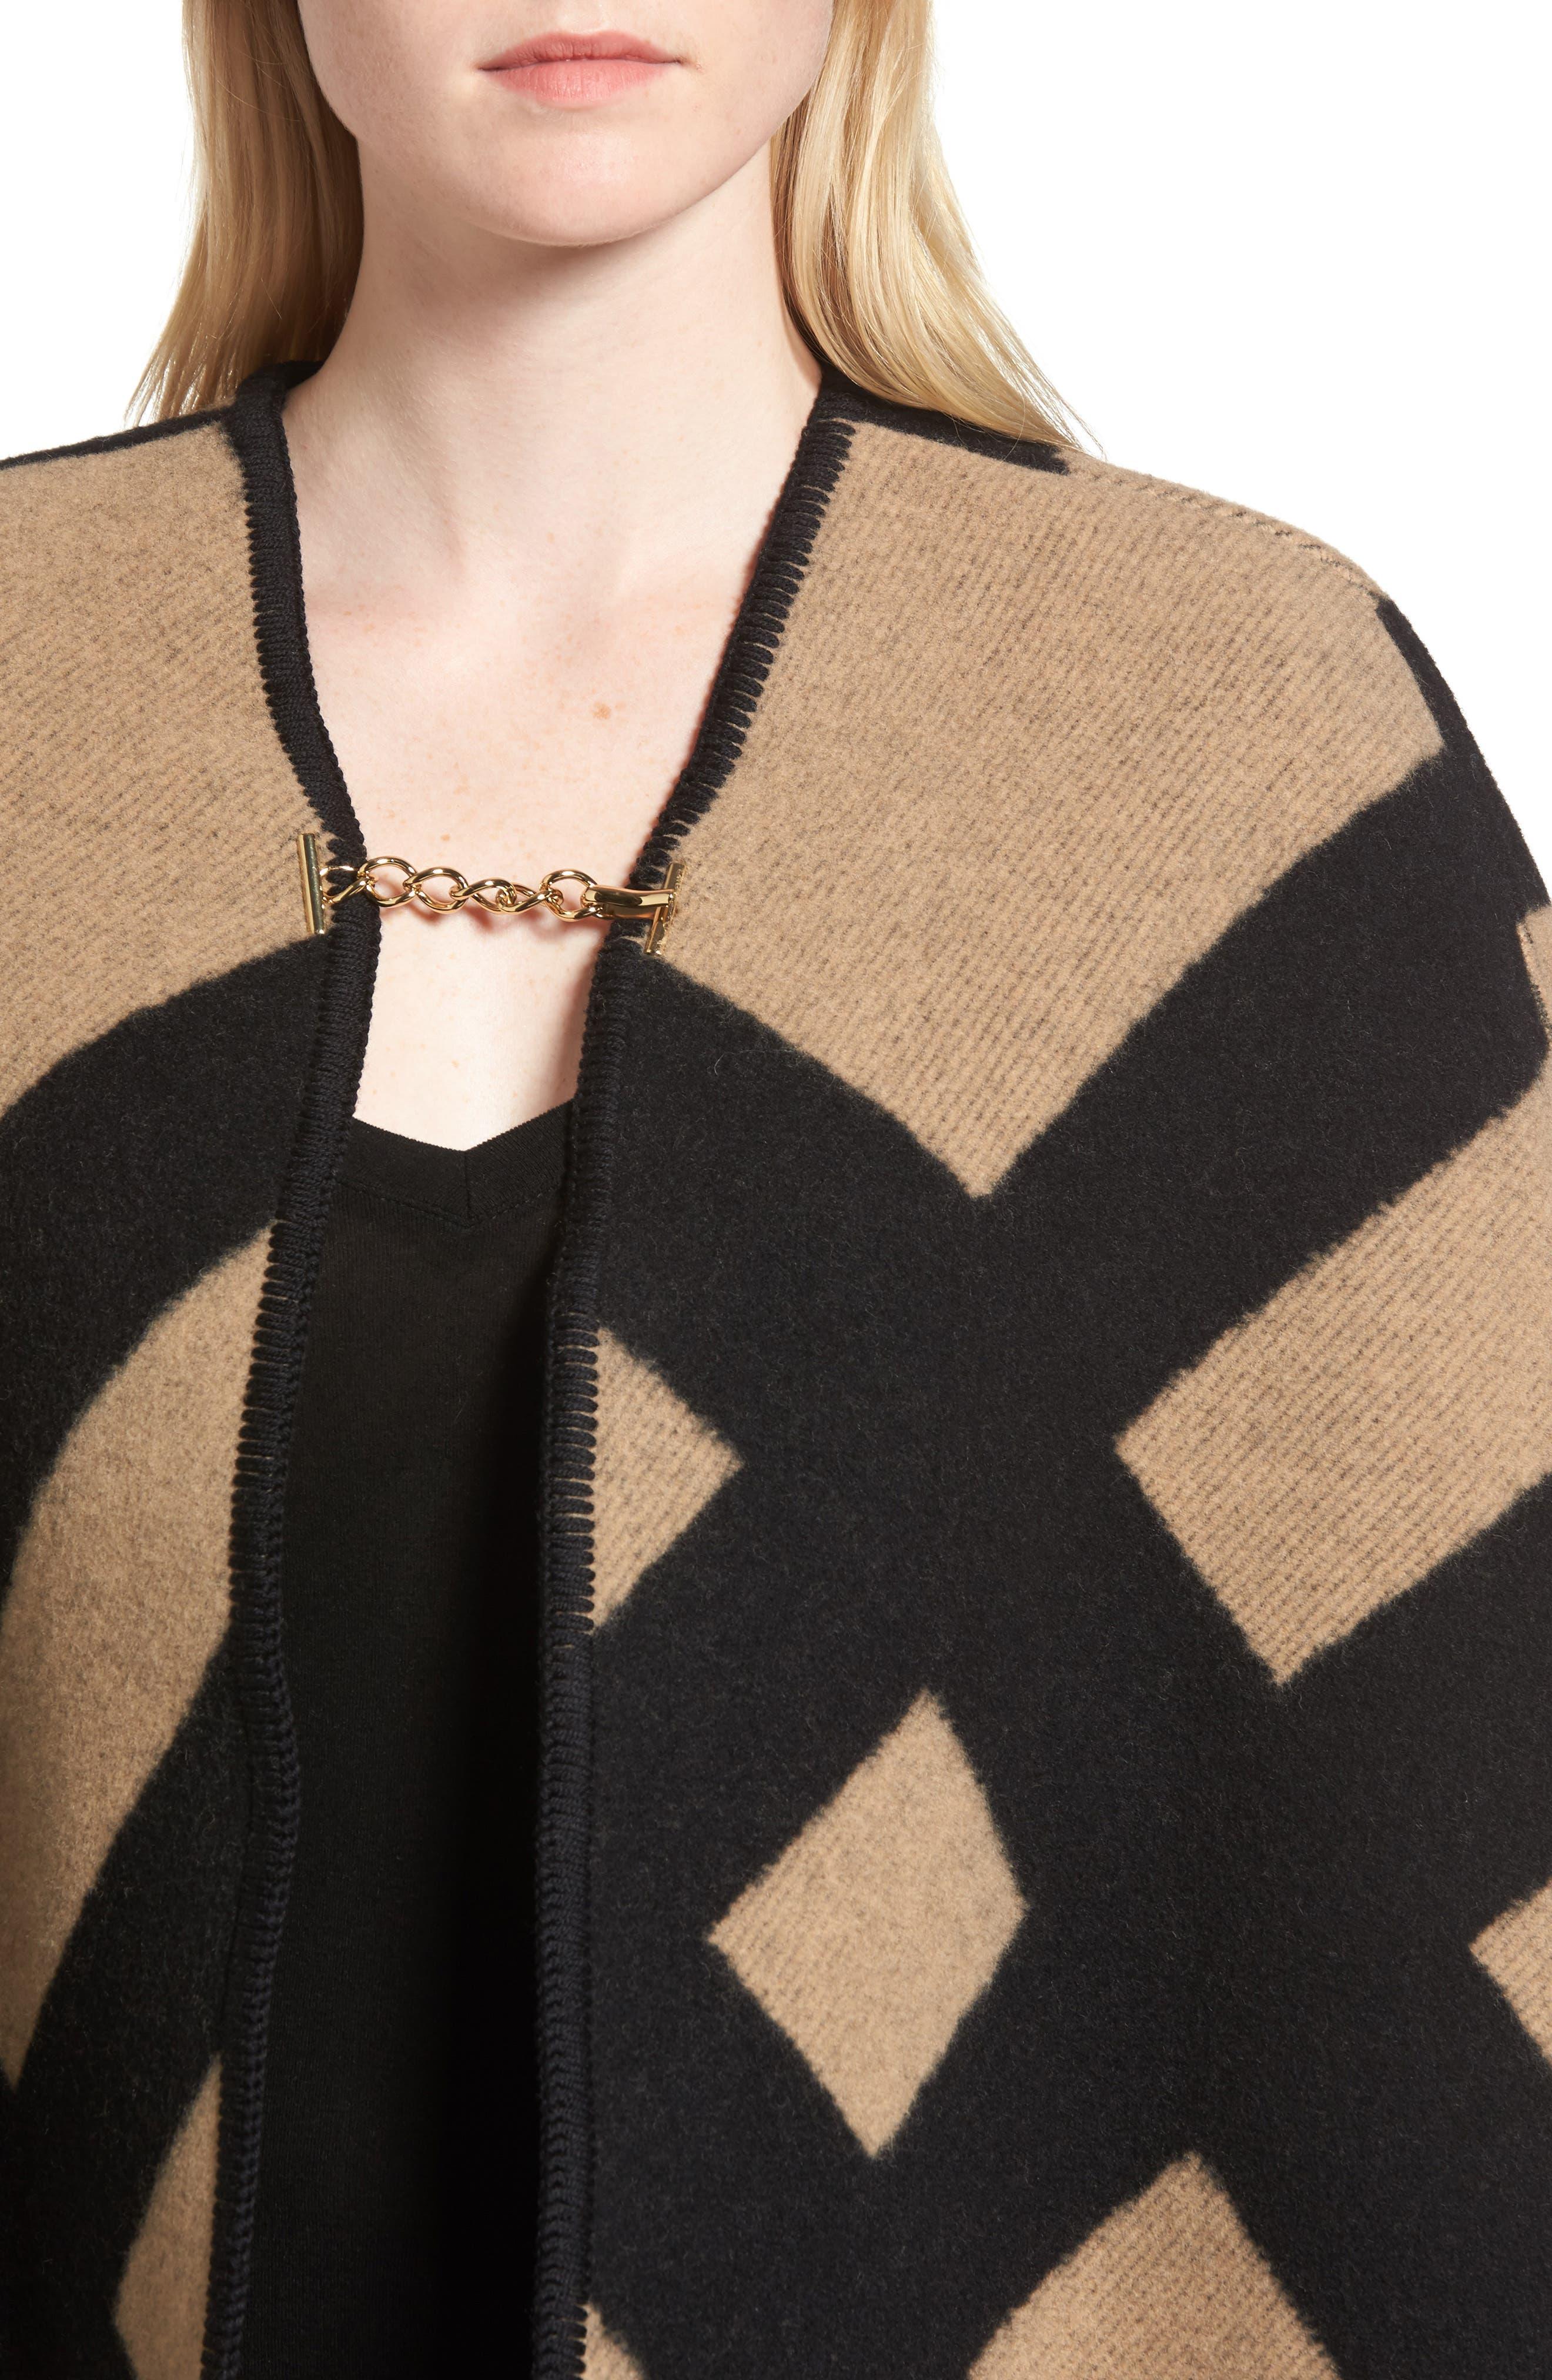 Blanket Check Wool & Cashmere Poncho,                             Alternate thumbnail 4, color,                             CAMEL/ BLACK